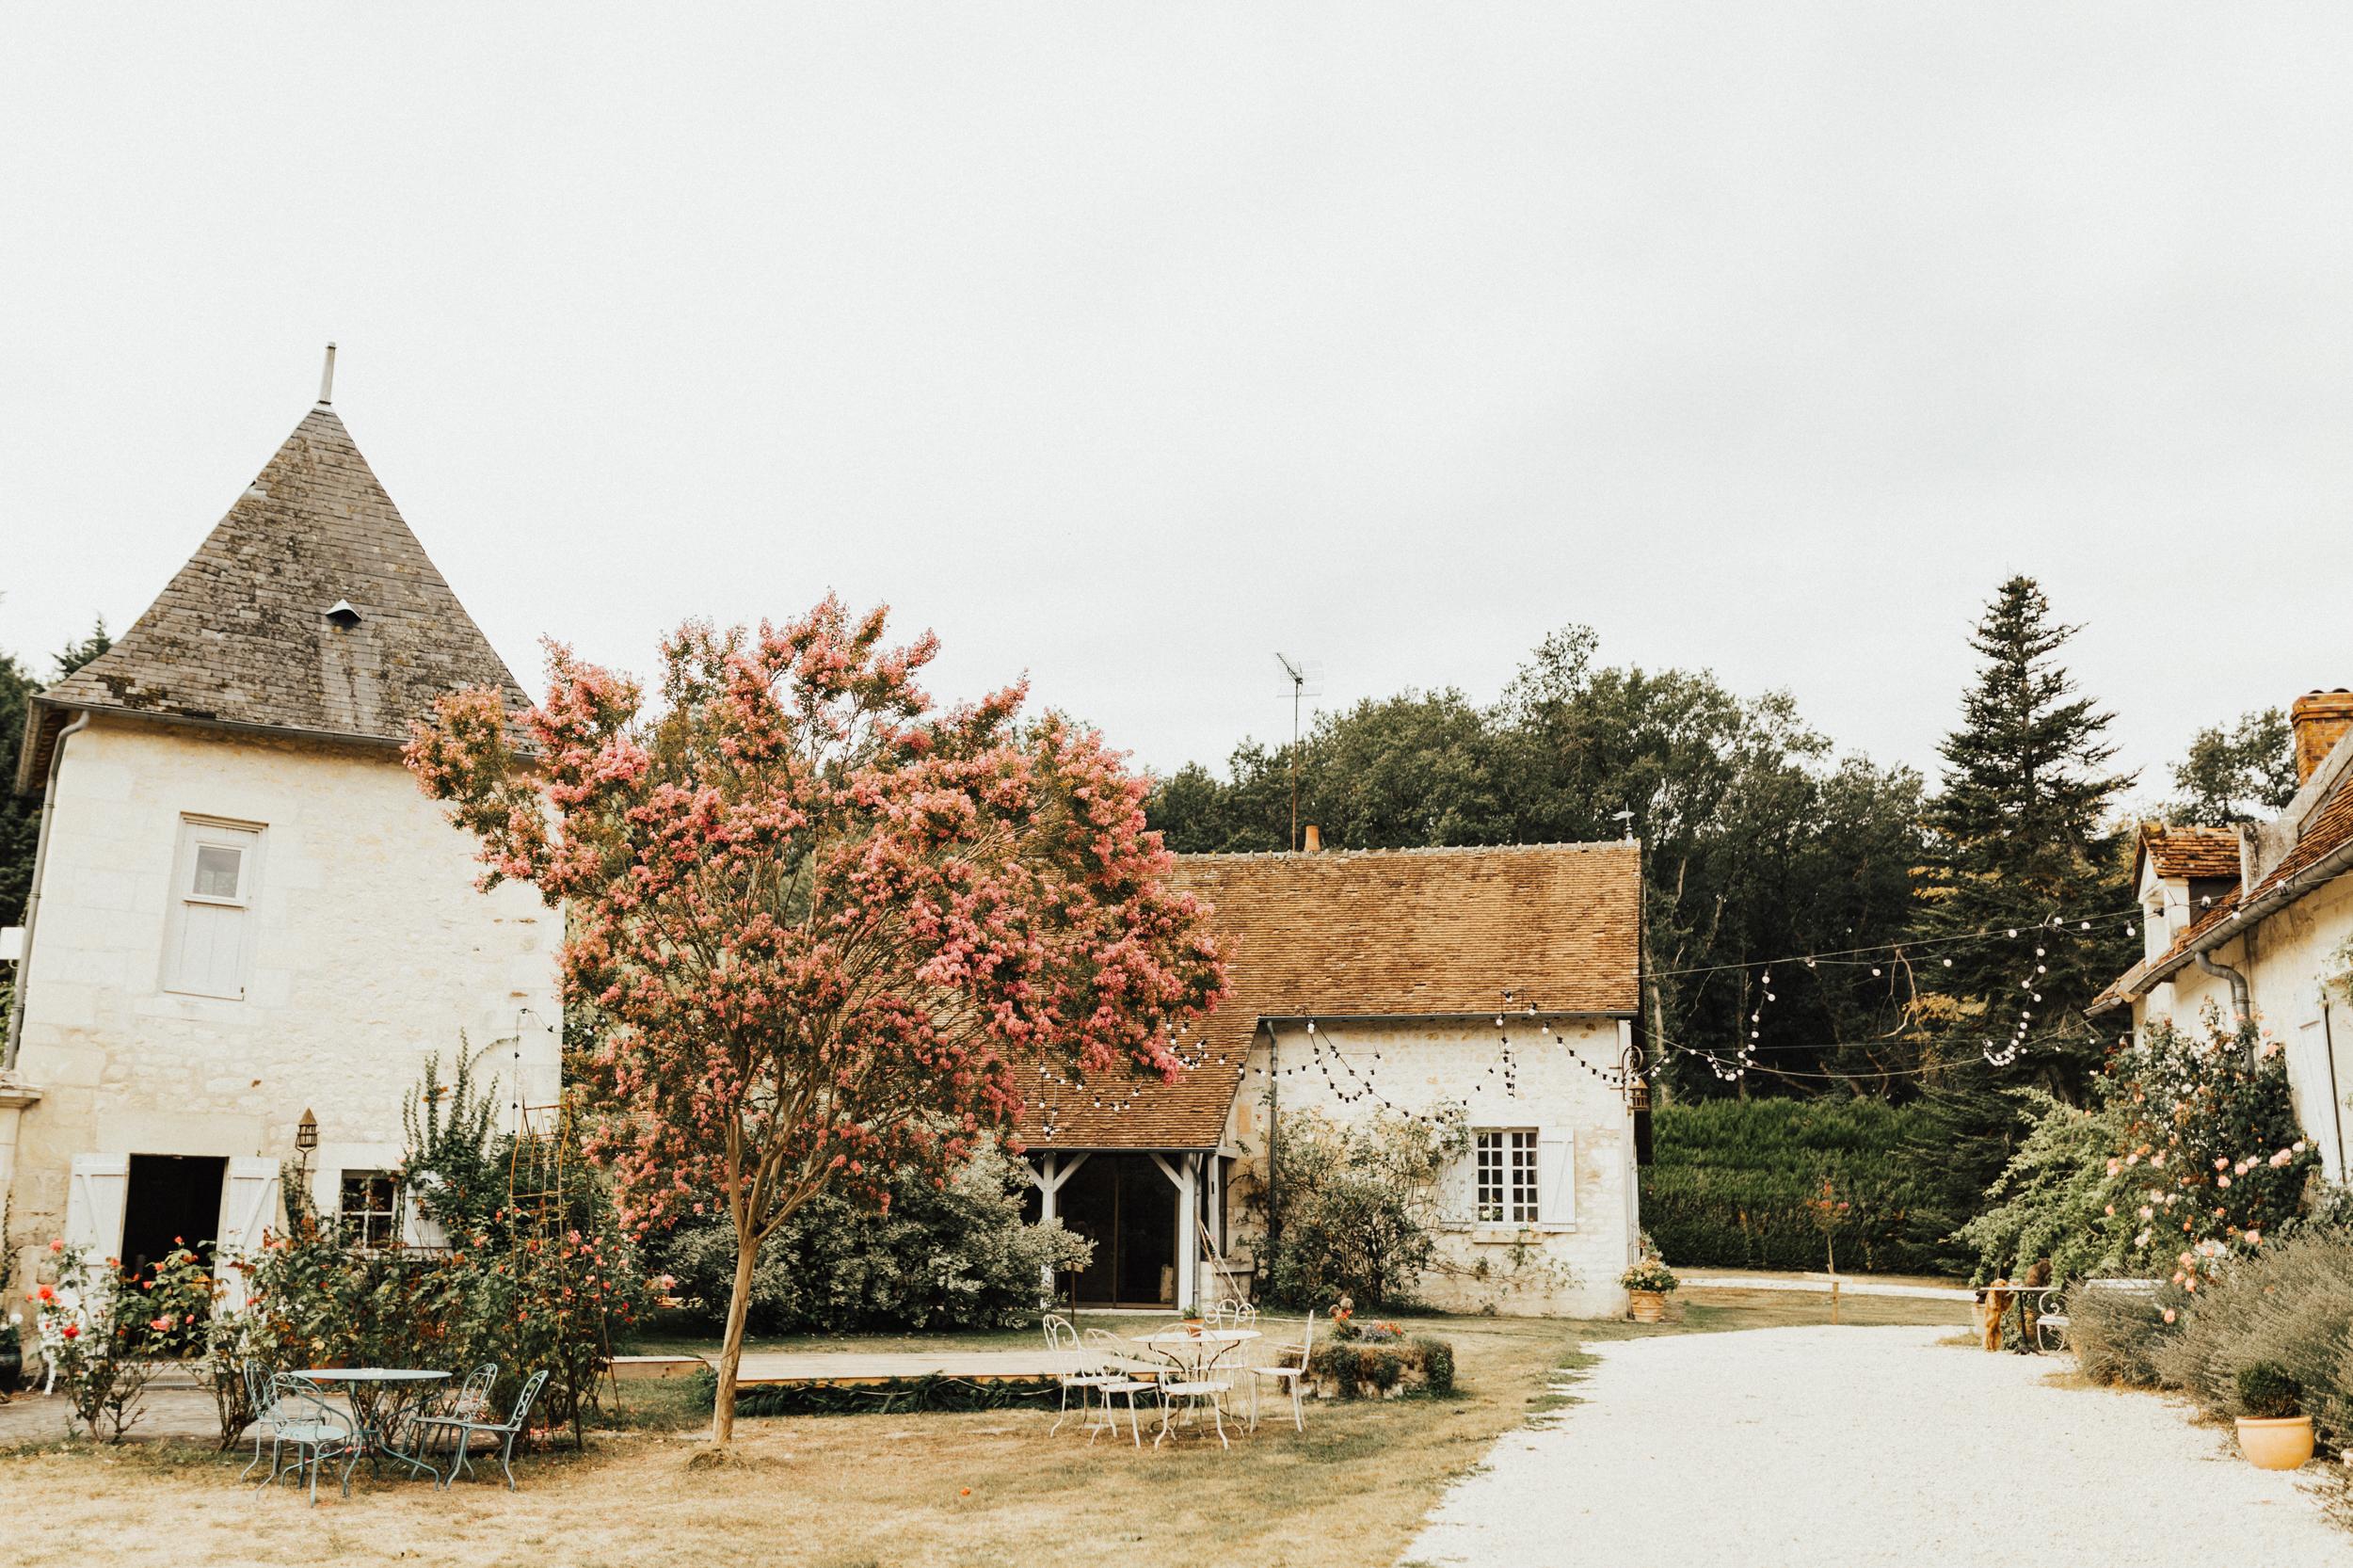 Amy-Zac-Destination-Wedding-France-Manoir-Foulquetiere-Darina-Stoda-Photography-2.jpg